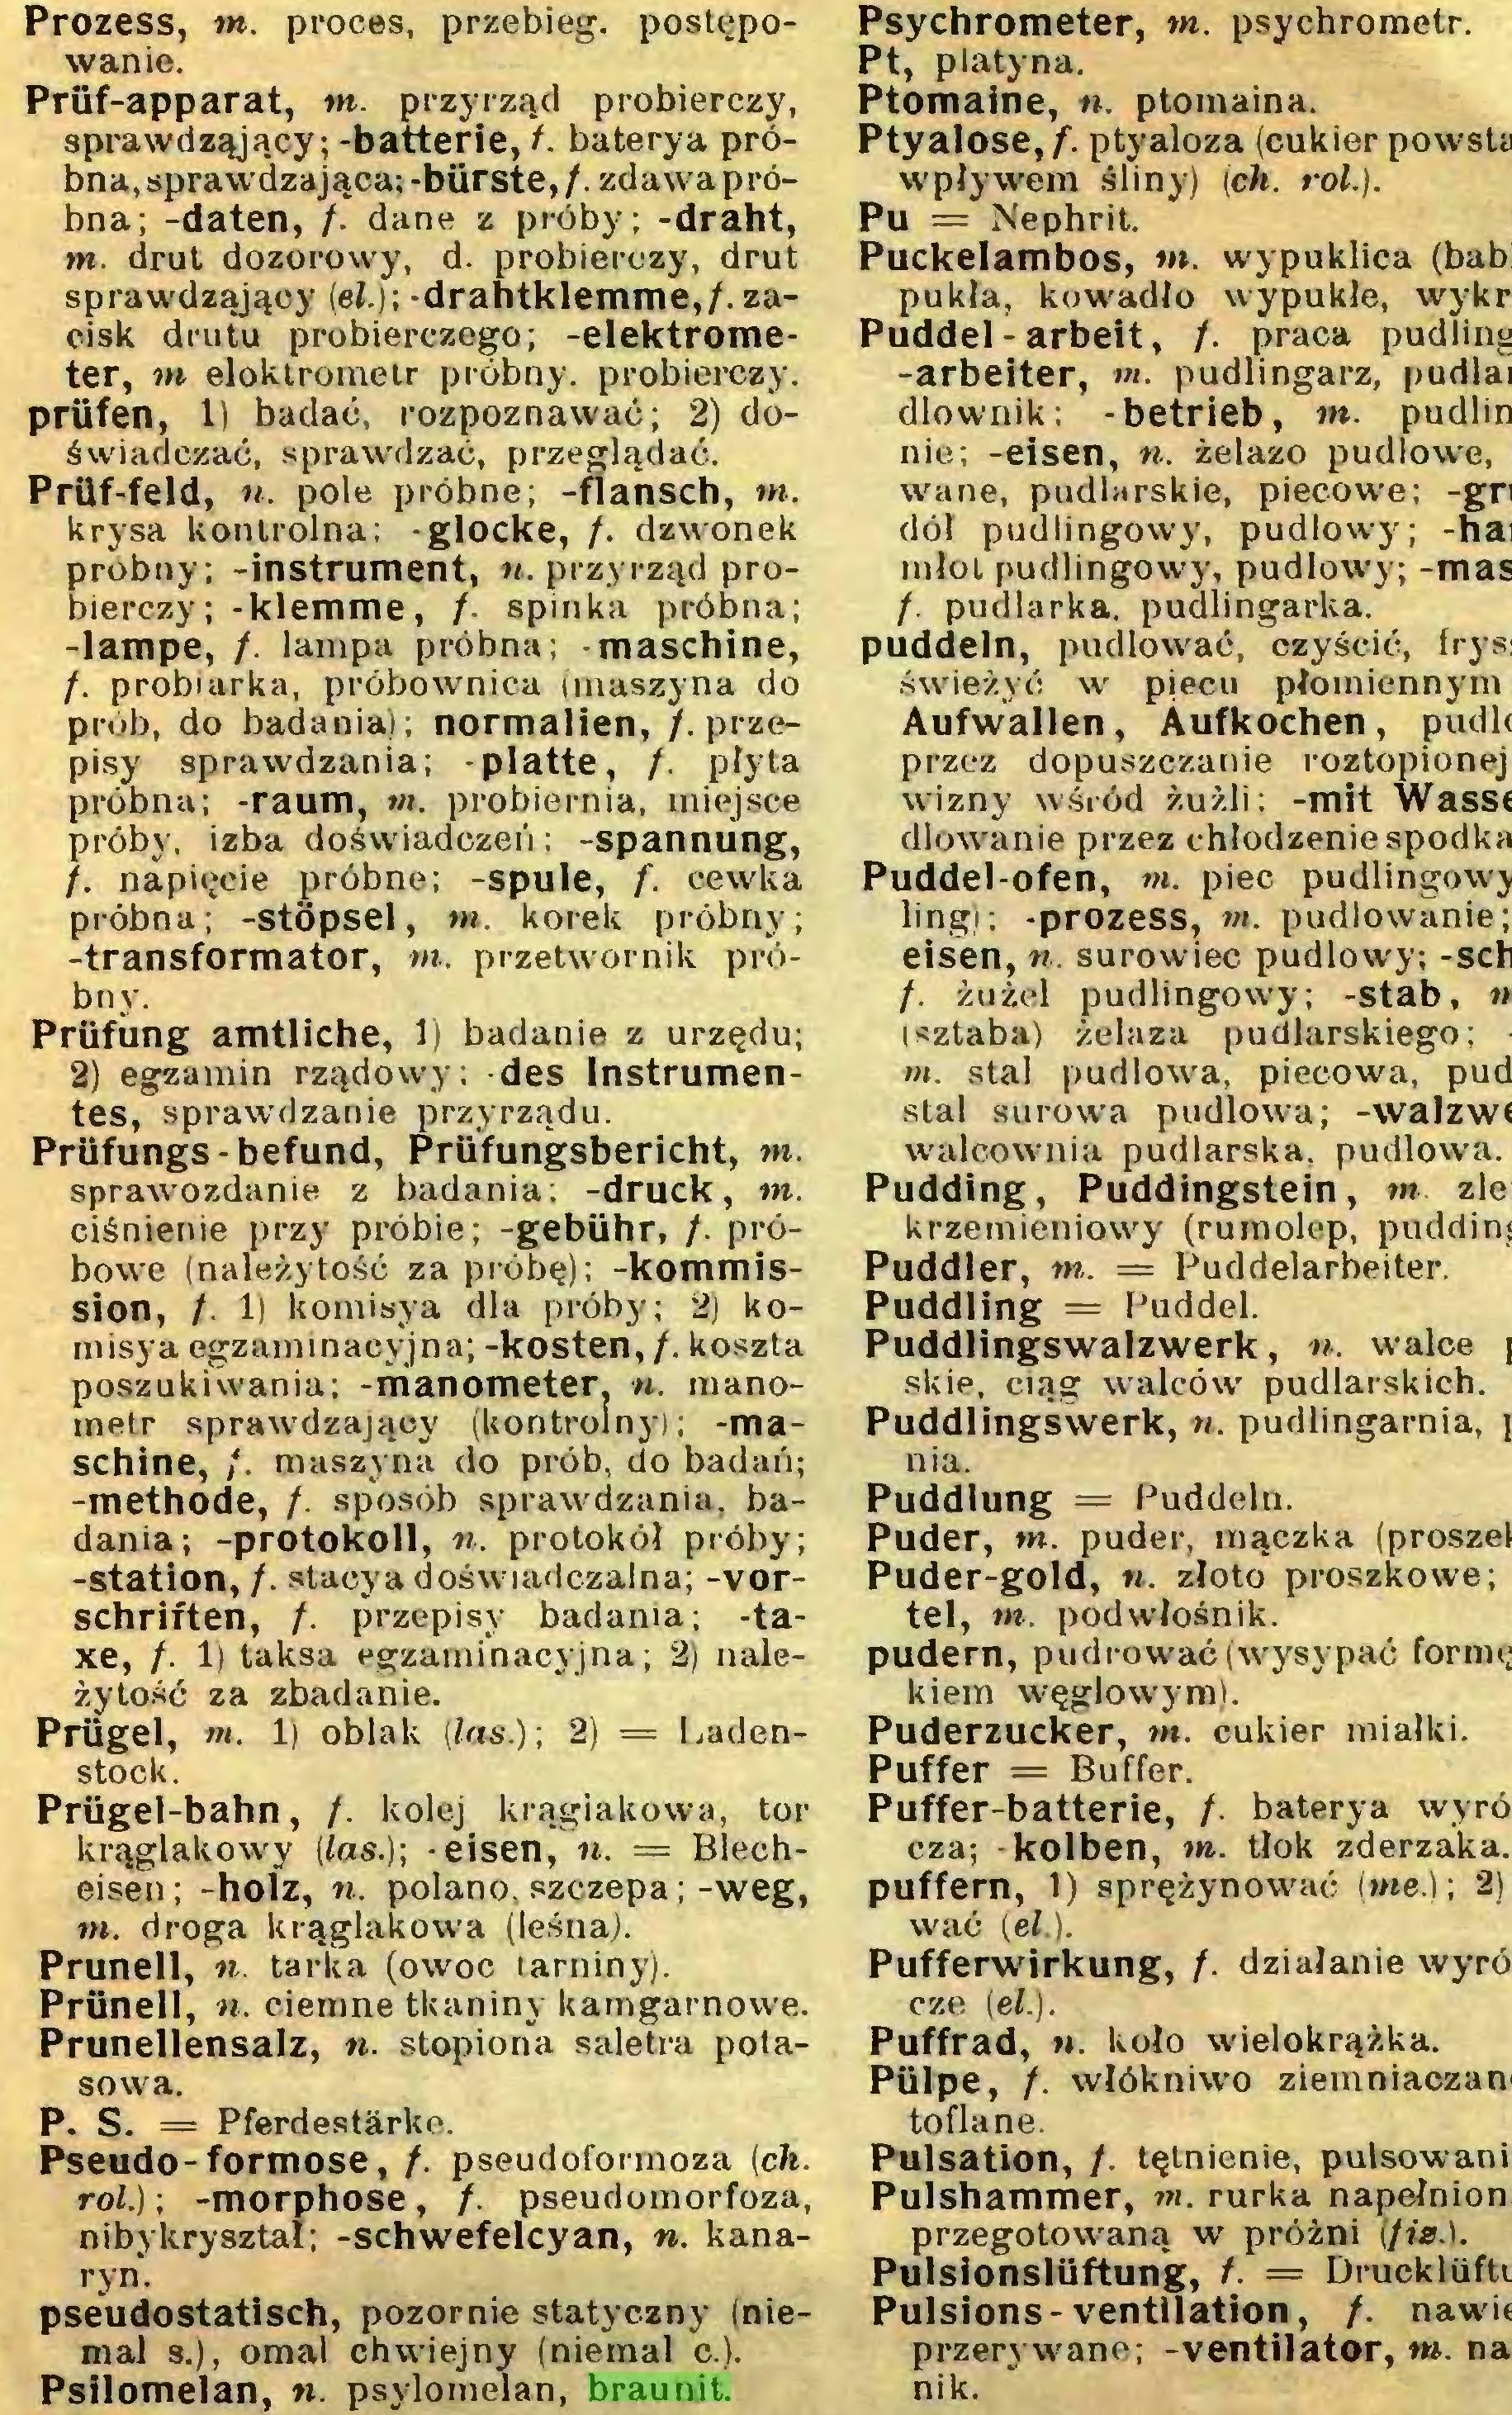 (...) Psilomelan, n. psylomelan, braunit. Psychrometer, tn. psychrometr...